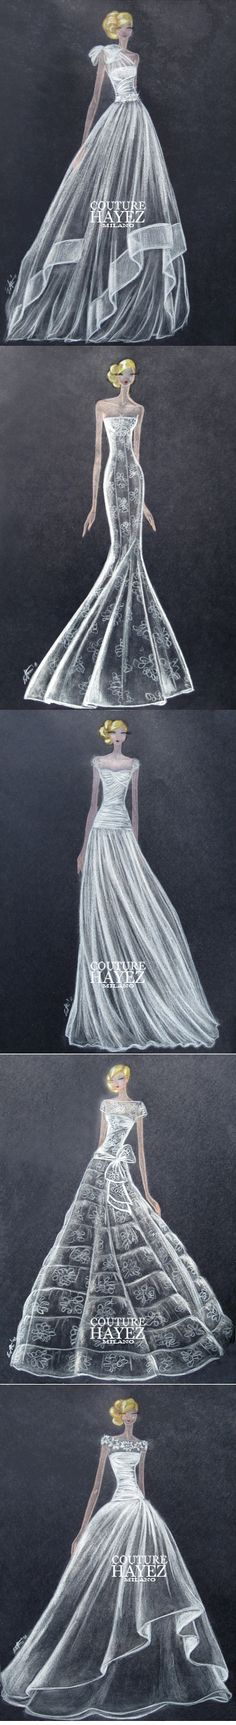 Couture Hayez Atelier Milano http://www.couturehayez.com/